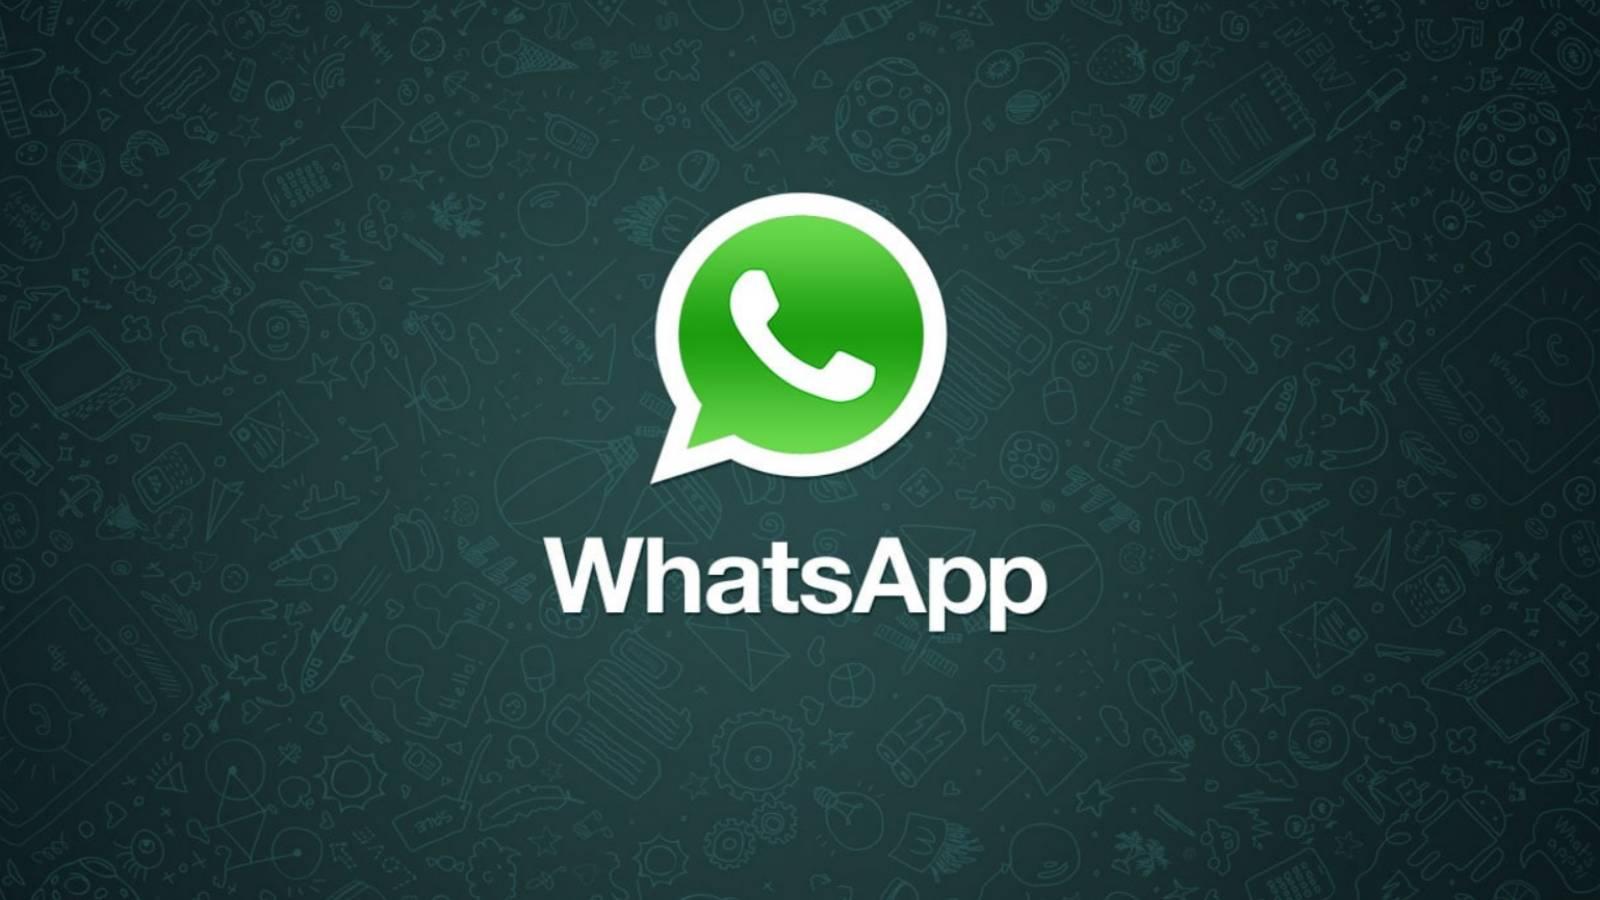 WhatsApp solutionare